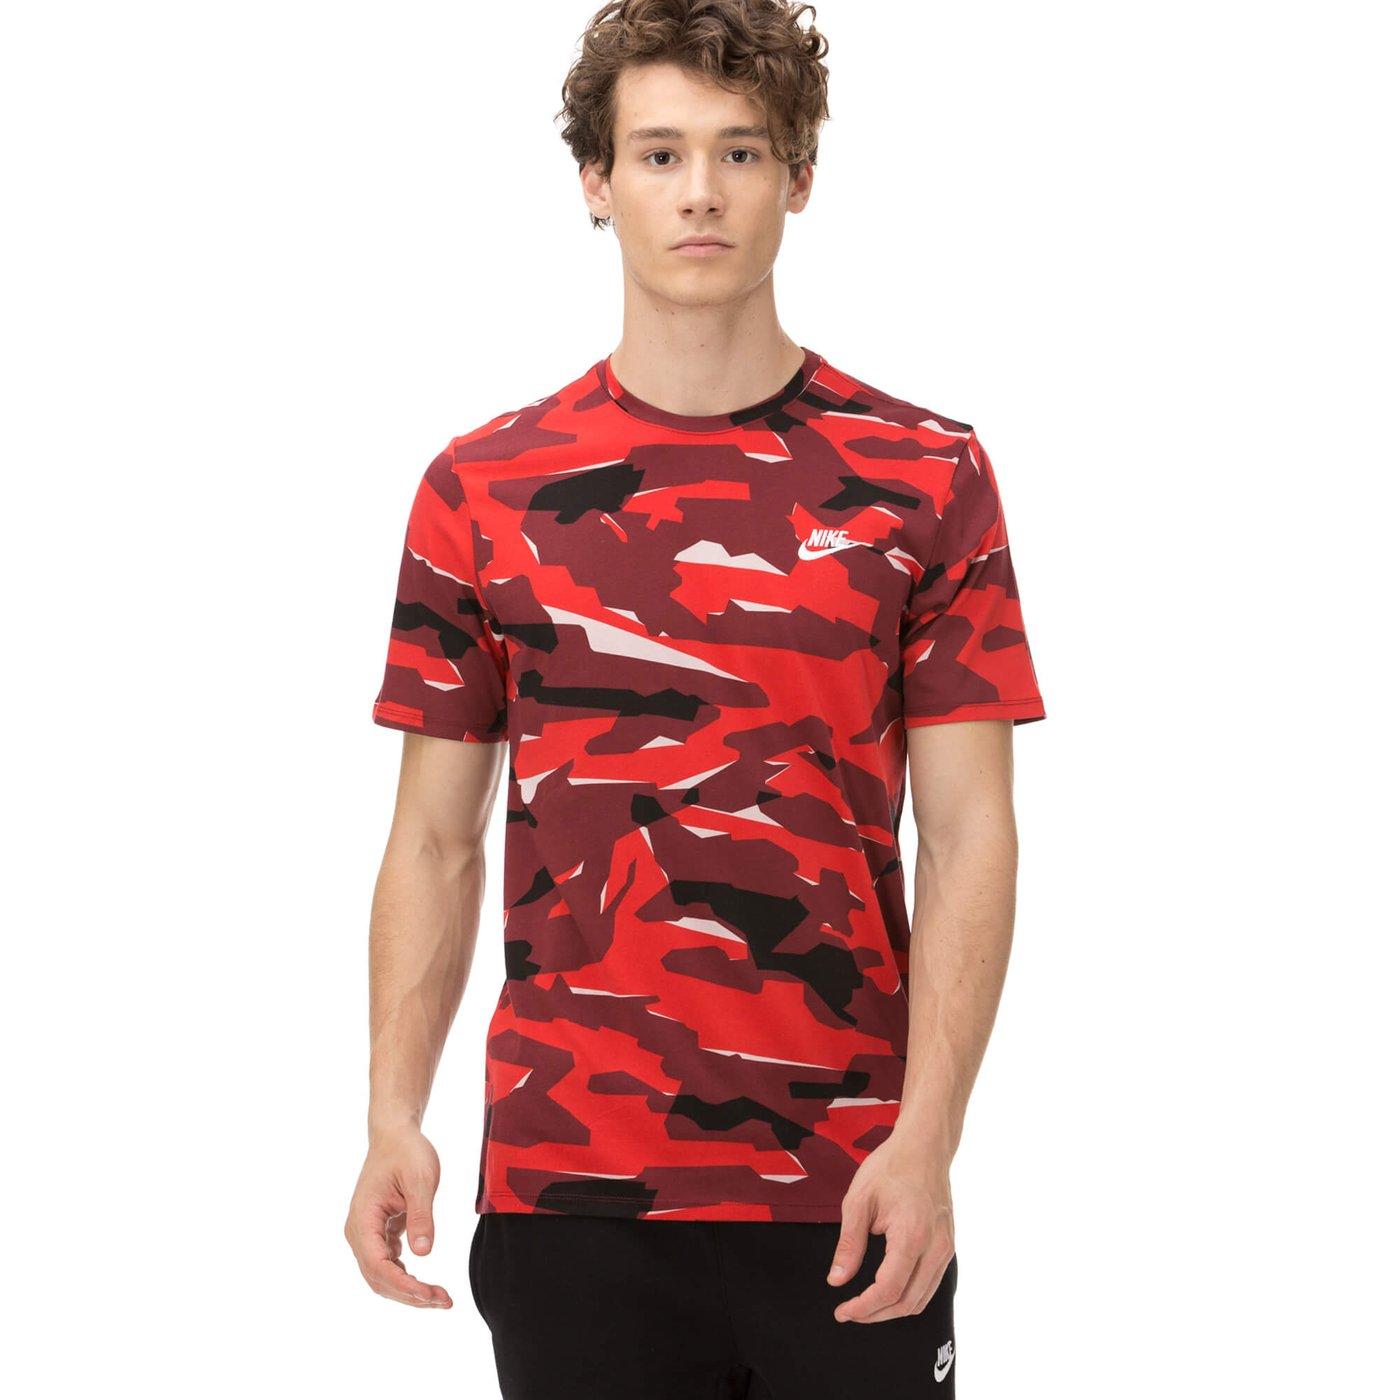 Nike Erkek Kamuflaj Kırmızı T-shirt